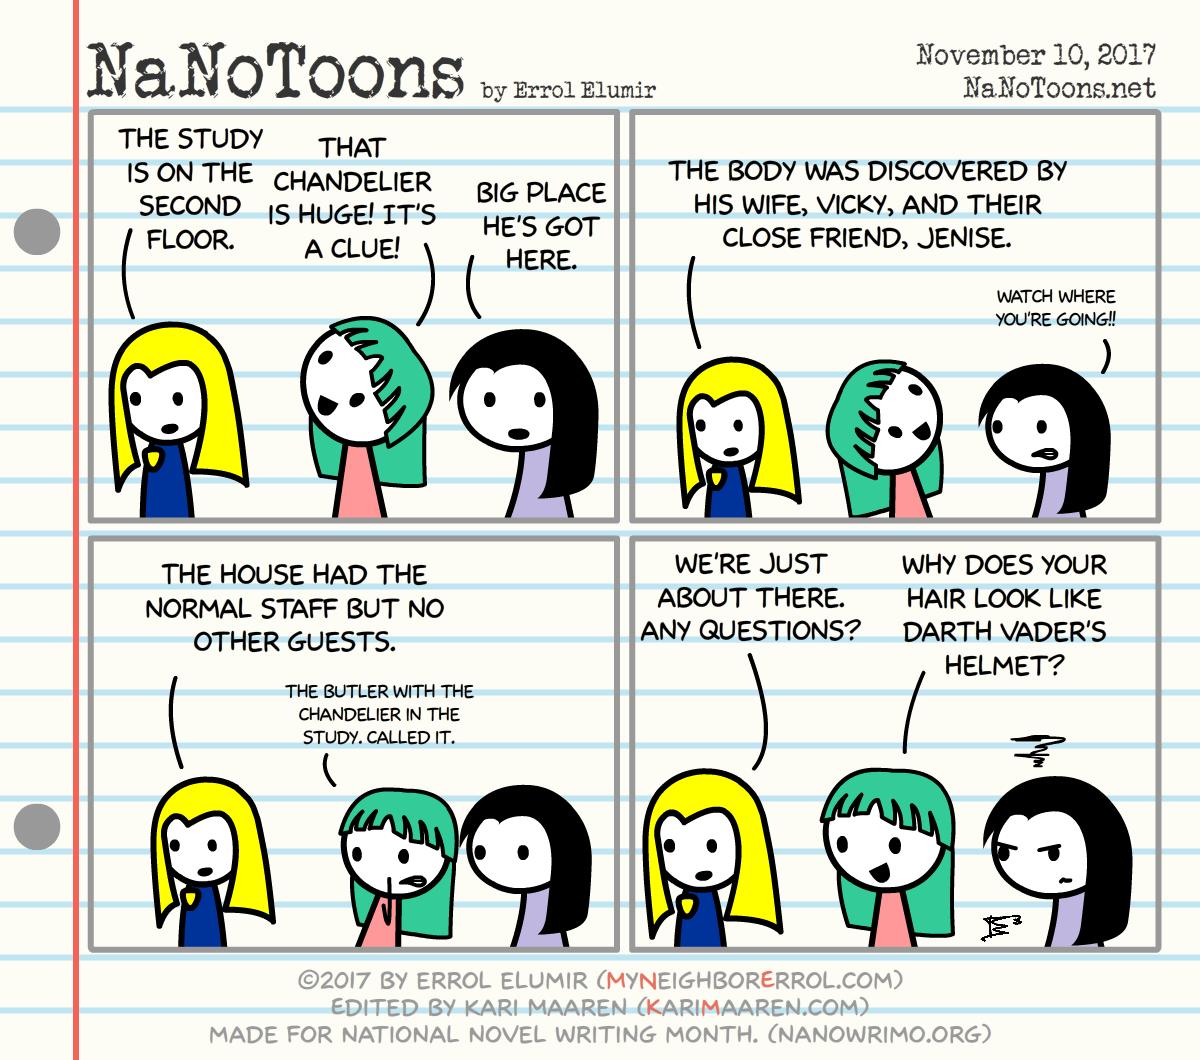 NaNoToons_2017_10_10